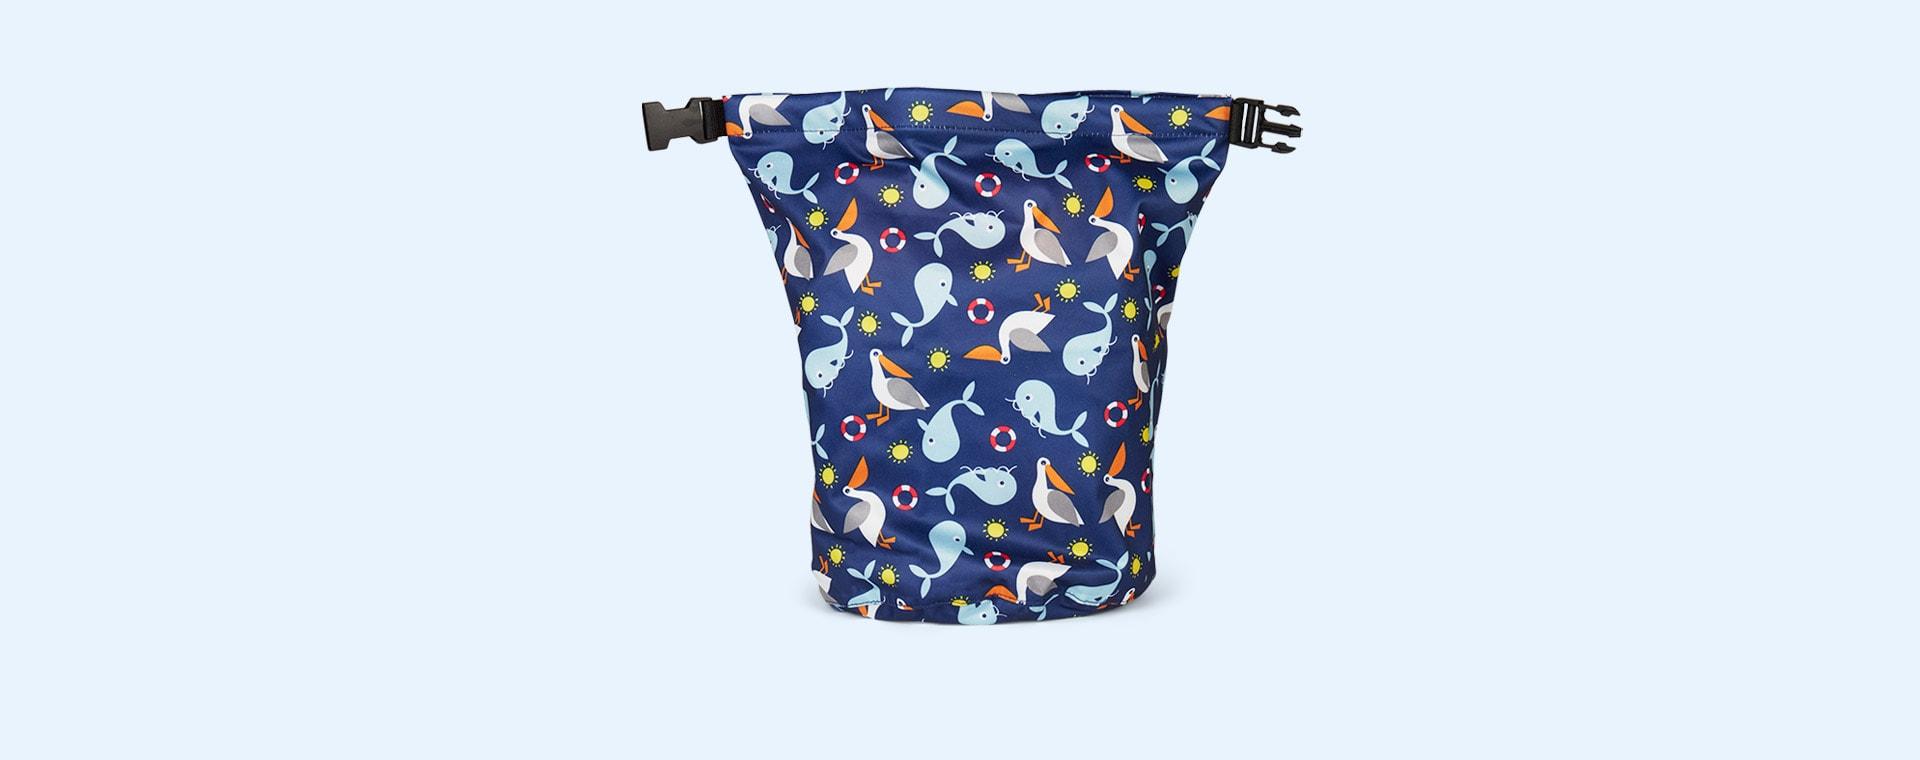 Nautical Bambino Mio Wet Bag